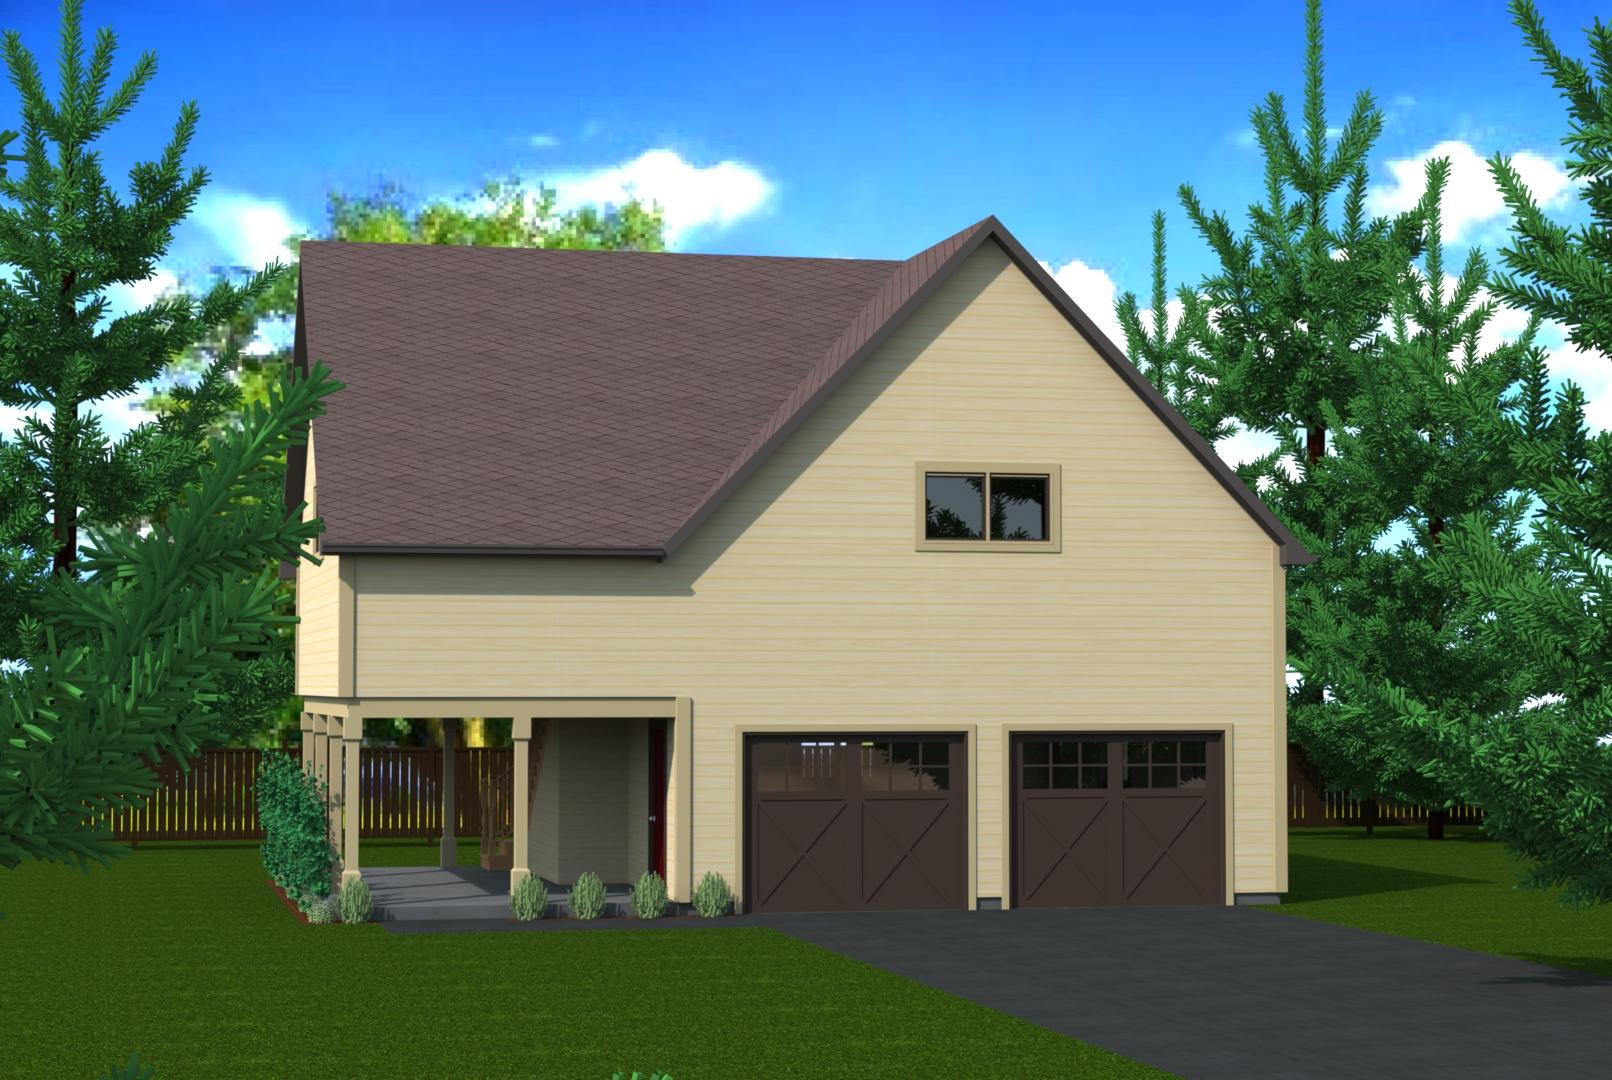 912 sq.ft. timber mart 2 car garage exterior render